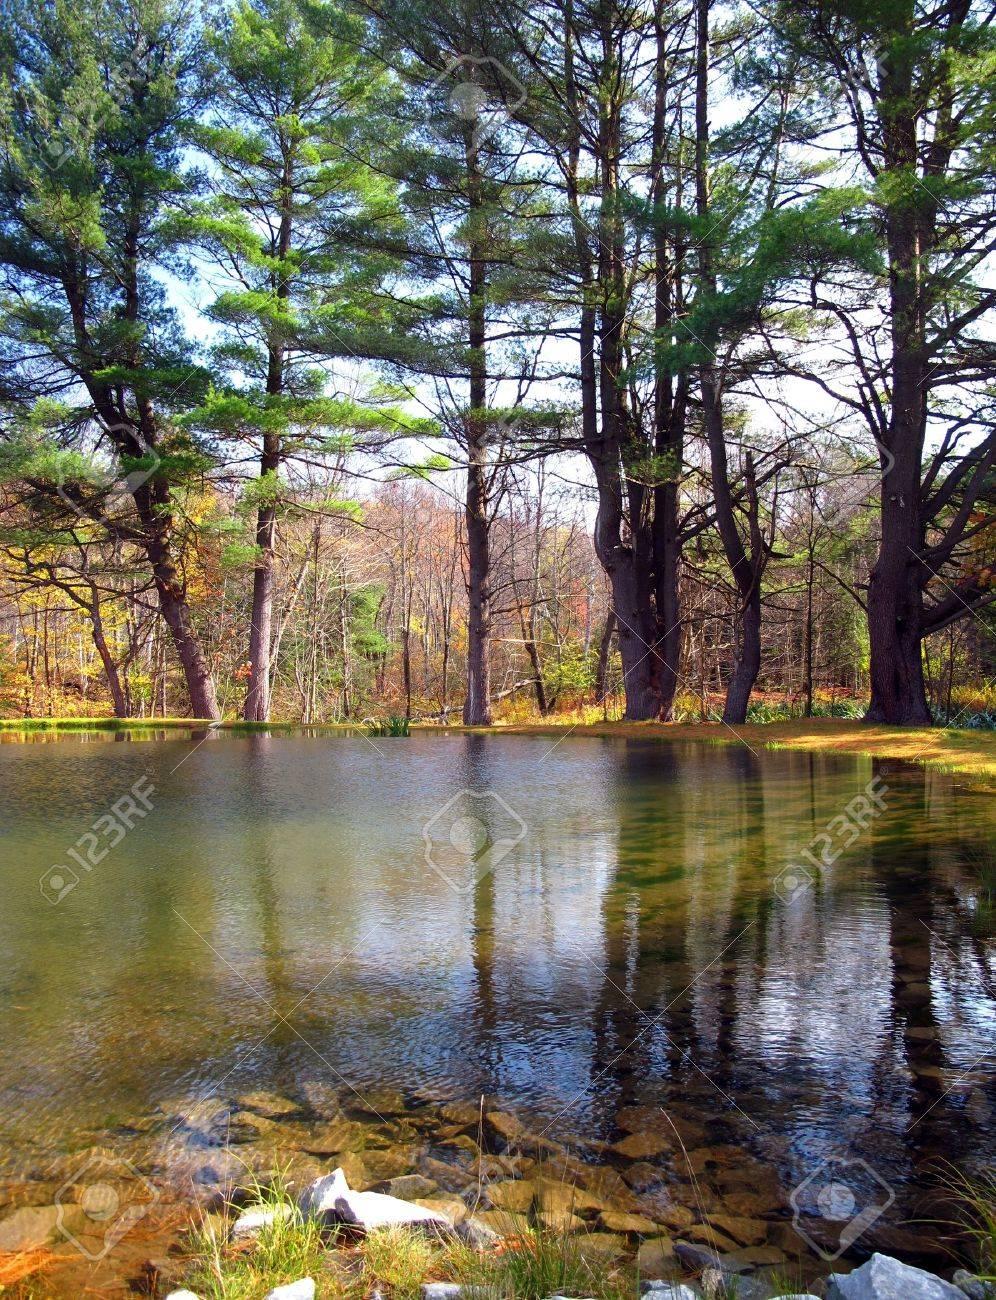 Still Pond Reflecting Autumn Trees Stock Photo - 10400675